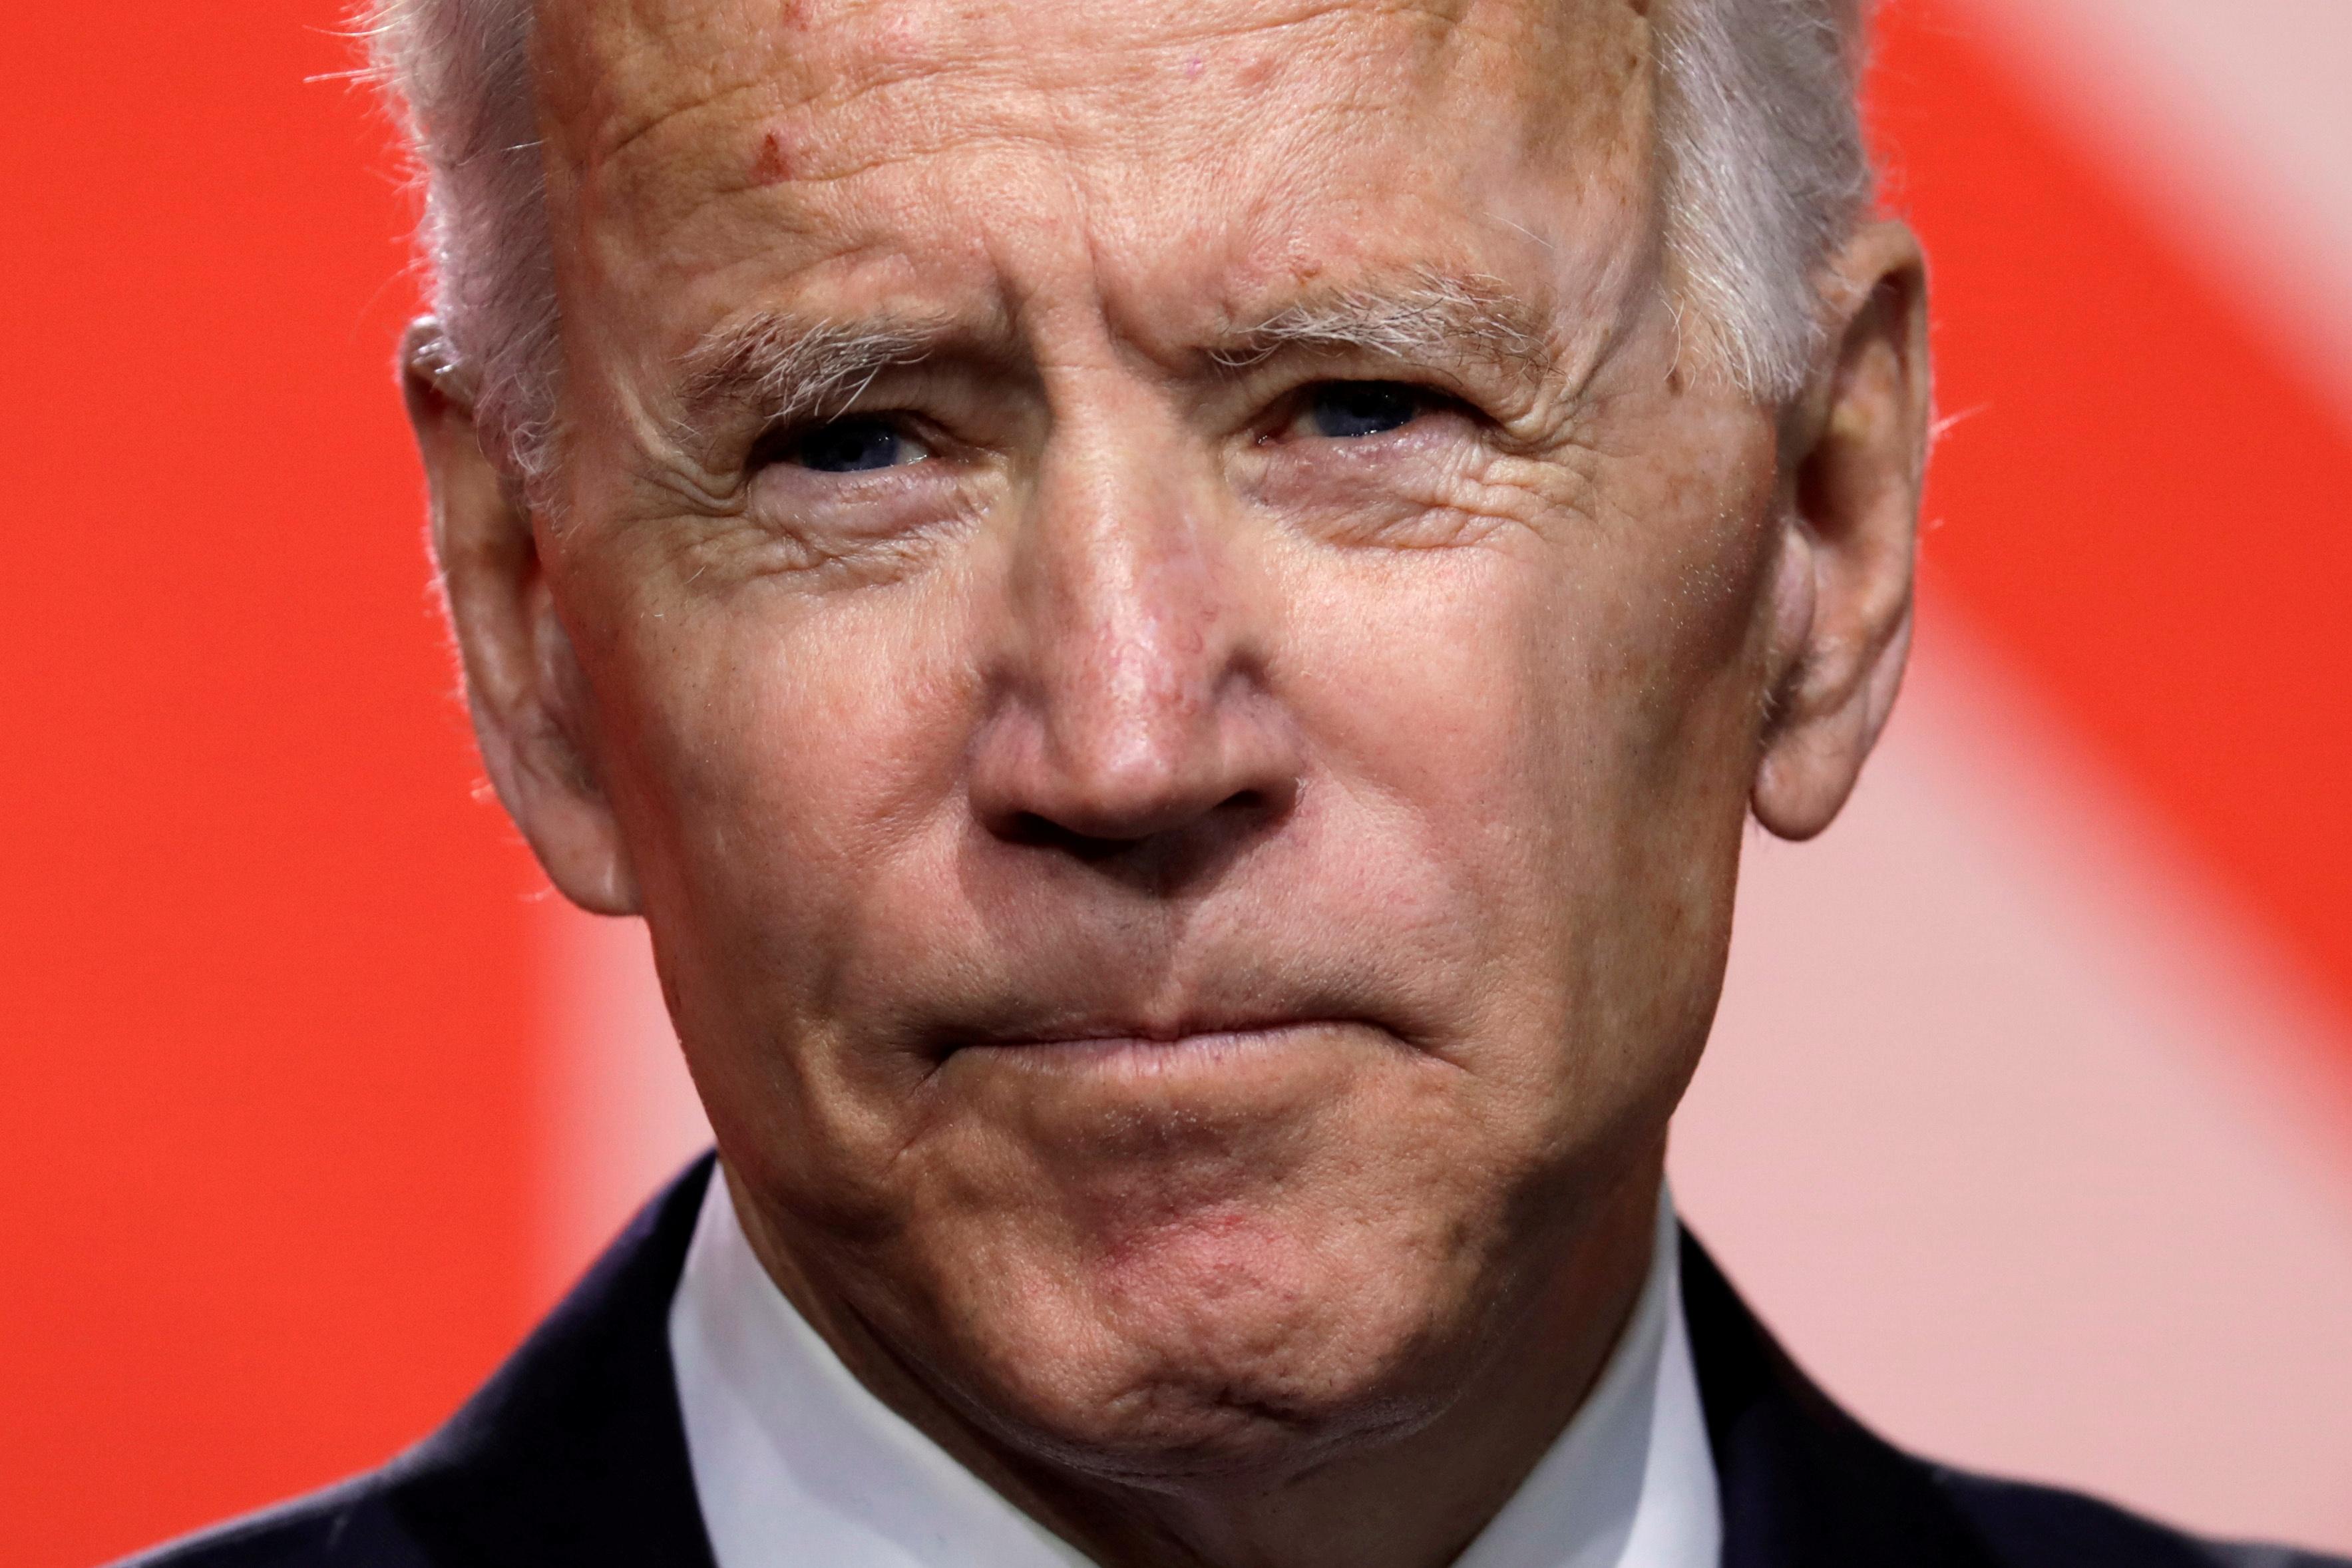 FILE PHOTO: Former U.S. Vice President Joe Biden in Washington, U.S., January 24, 2019. REUTERS/Yuri Gripas